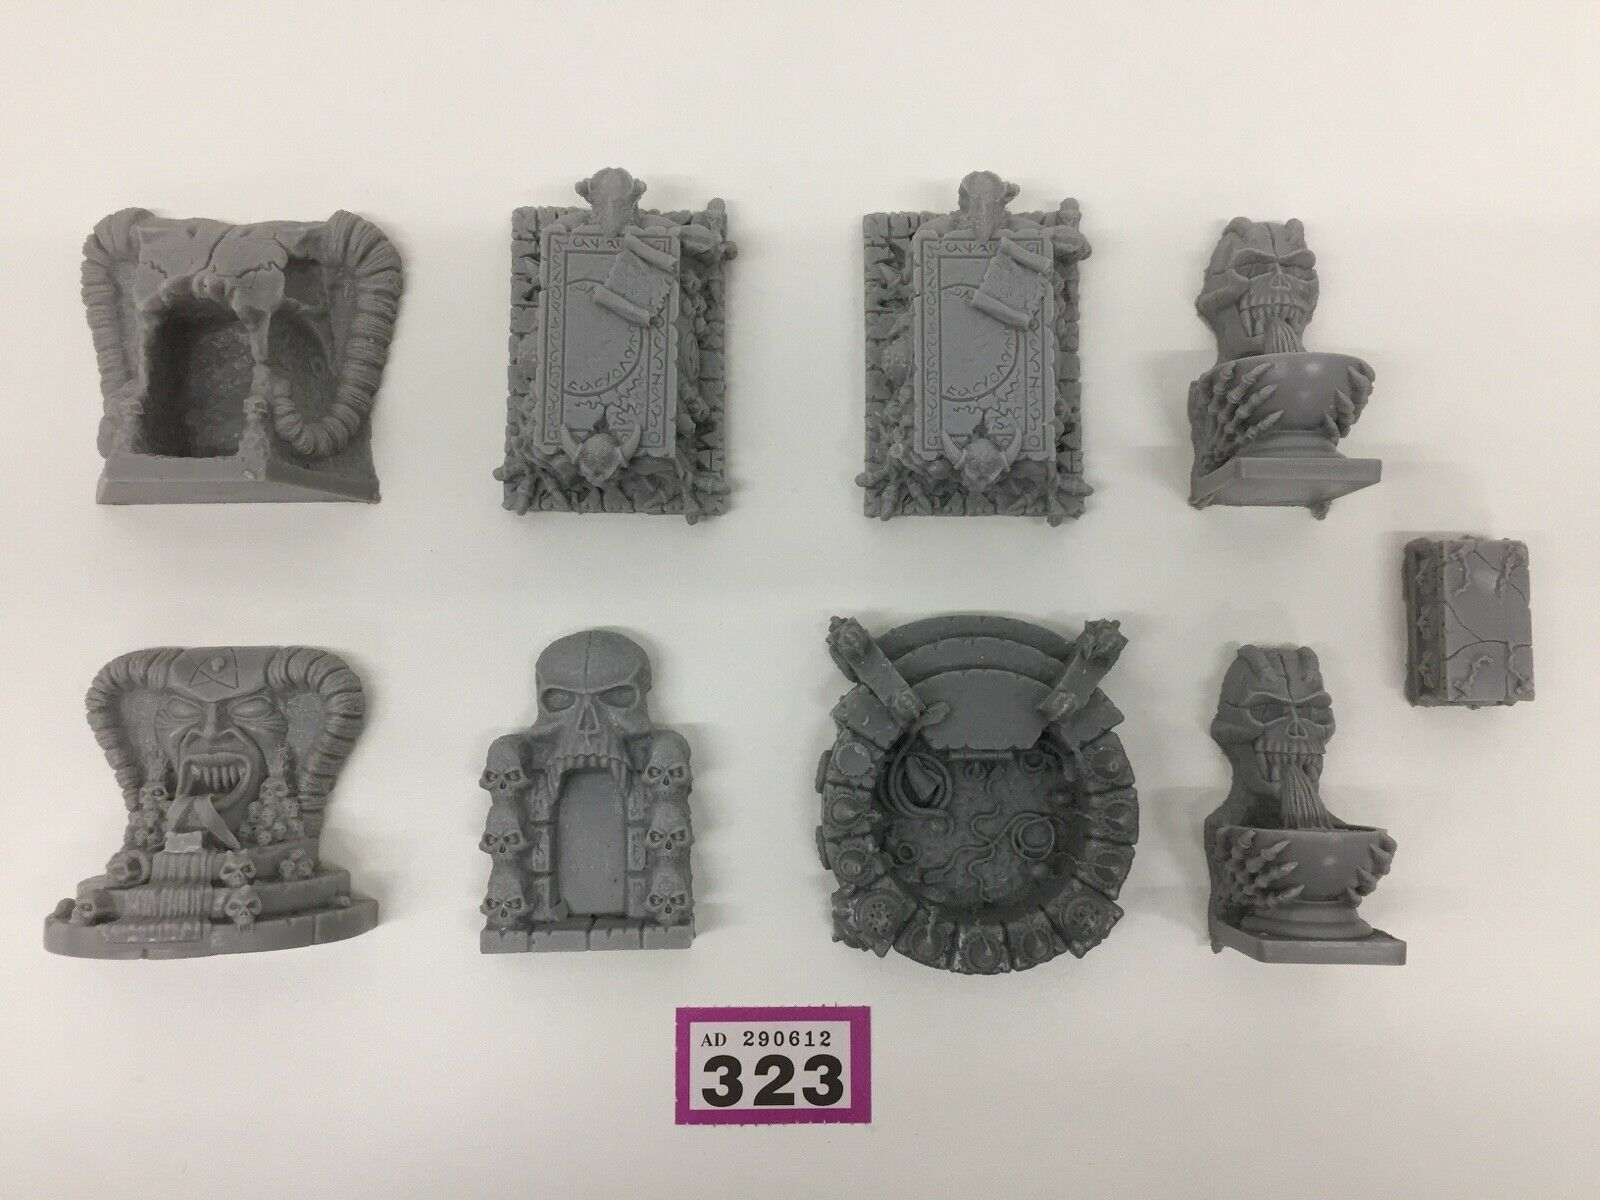 Warhammer Fantasy Thundercats Age of Sigmar Donjons & Dragons Terrain Scenery Set